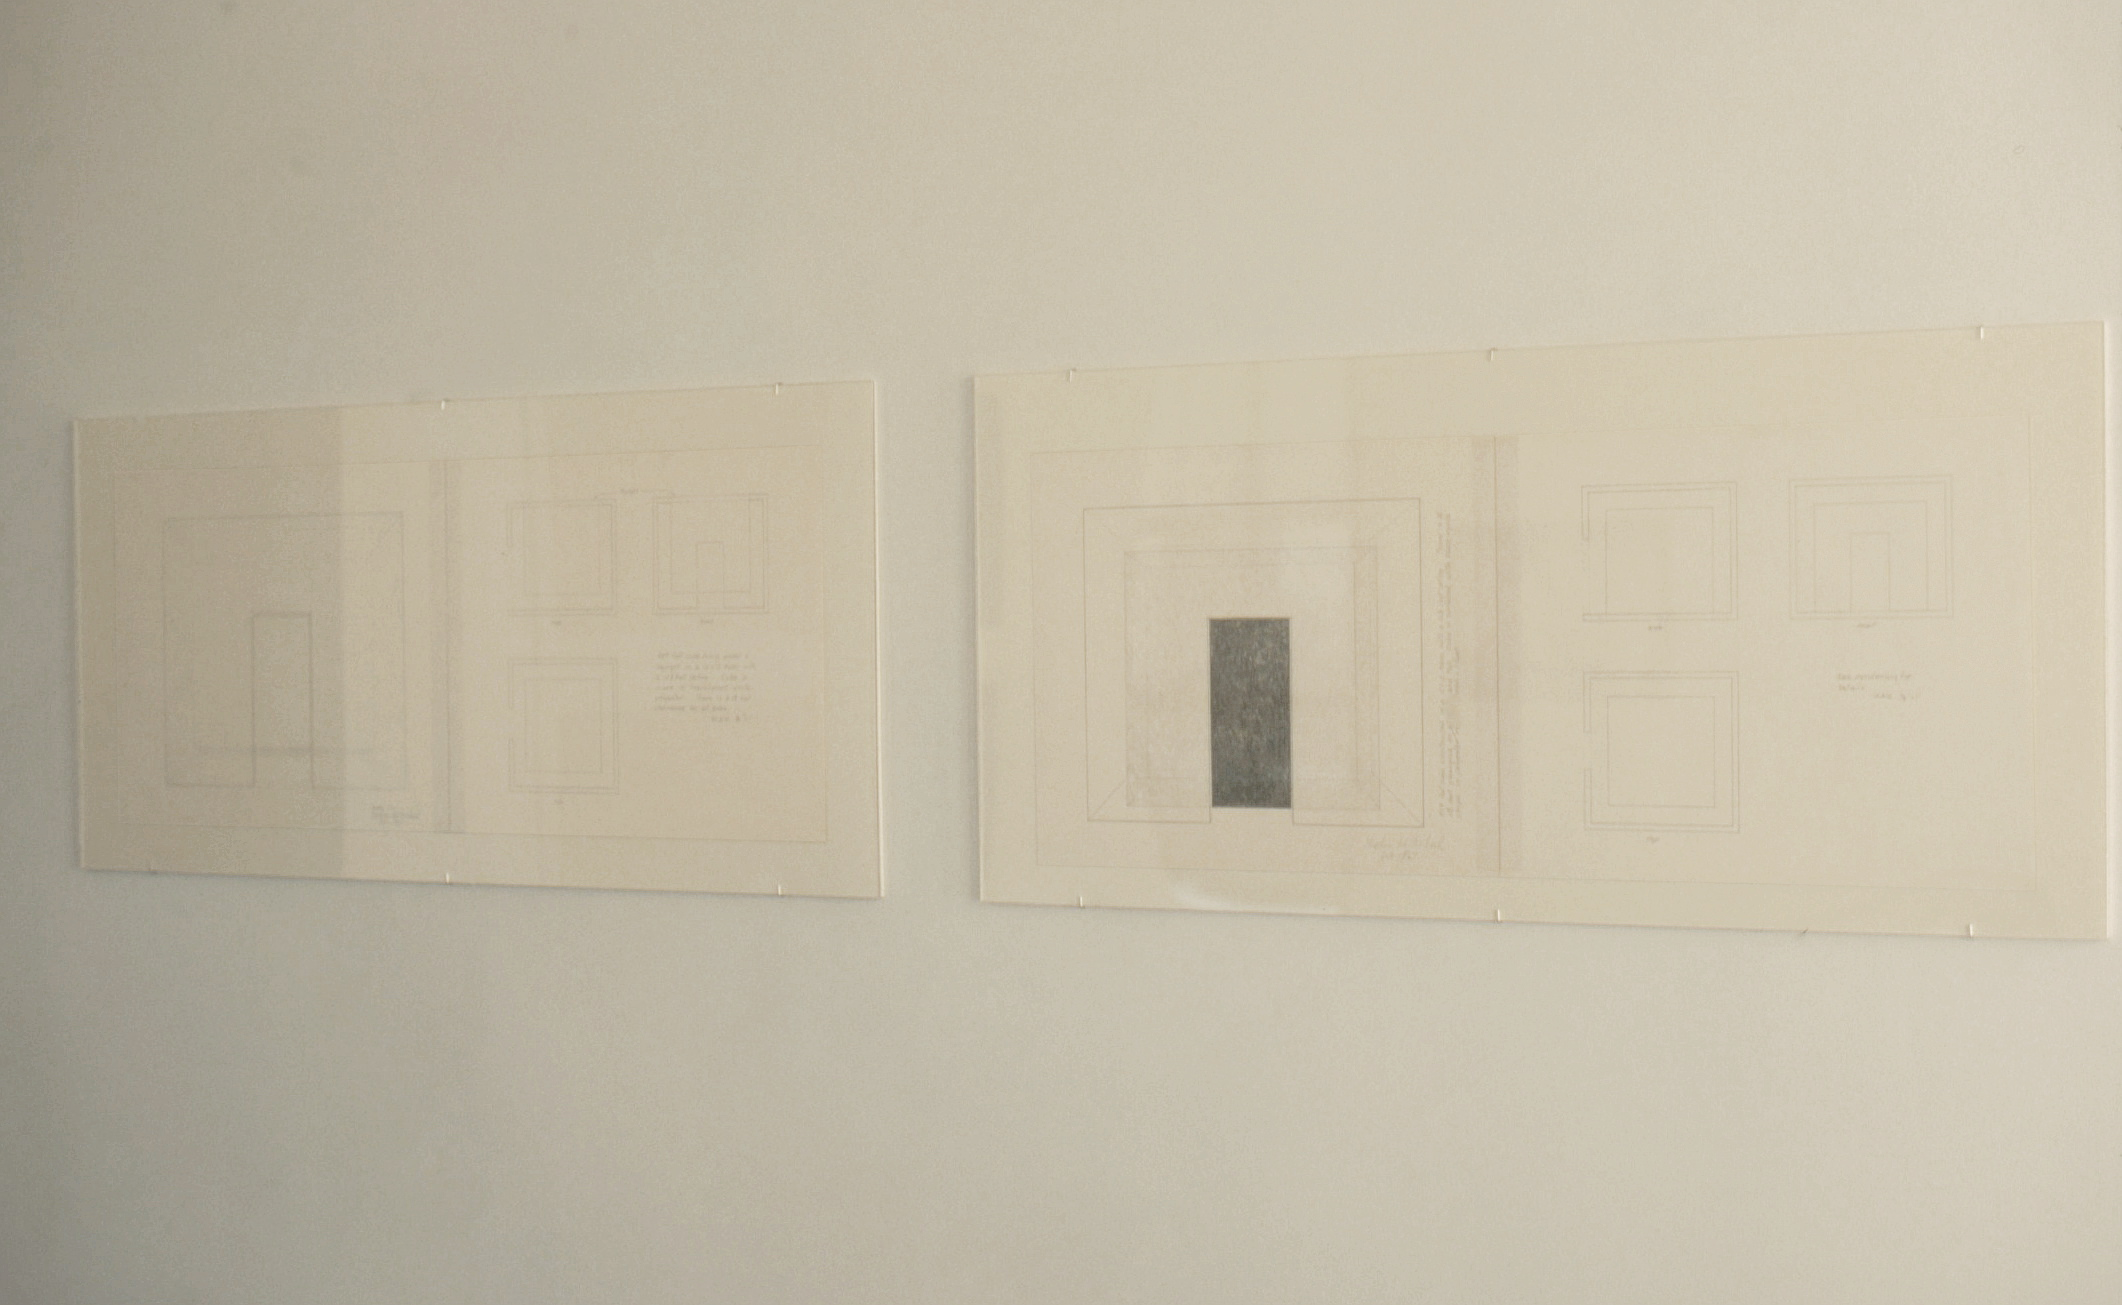 Stephen Kaltenbach at Lawrence Markey 2000 7.jpeg